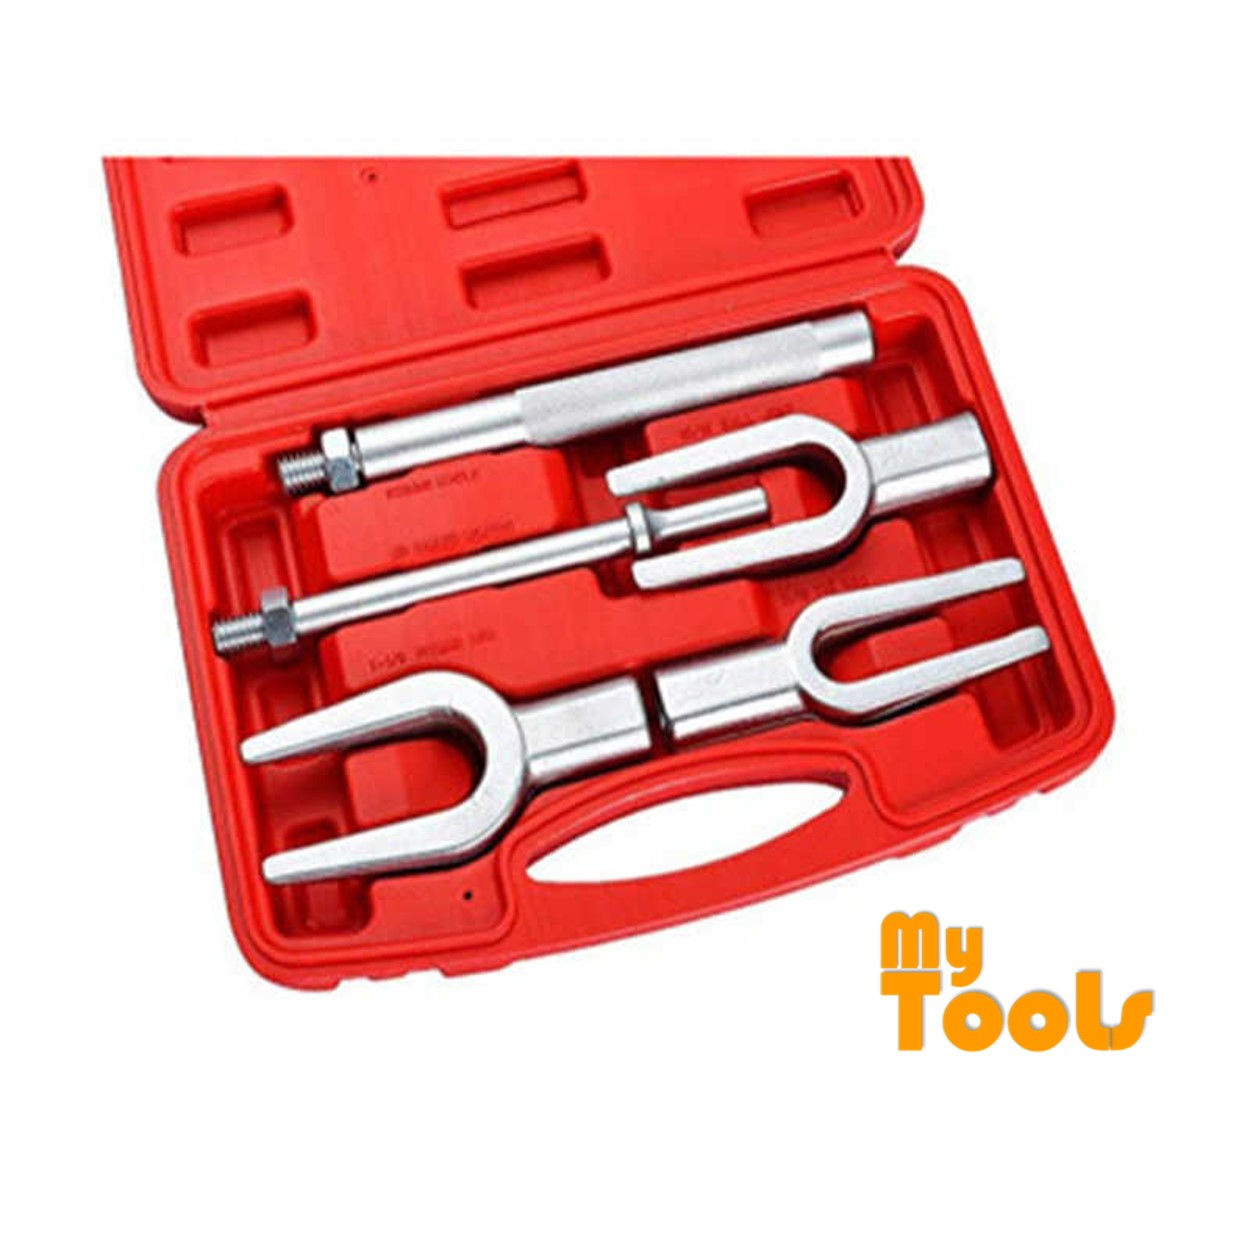 Mytools 5PCS Ball Joint Separator Tie Rod Pitman Arm Tools Kit Pickle Fork